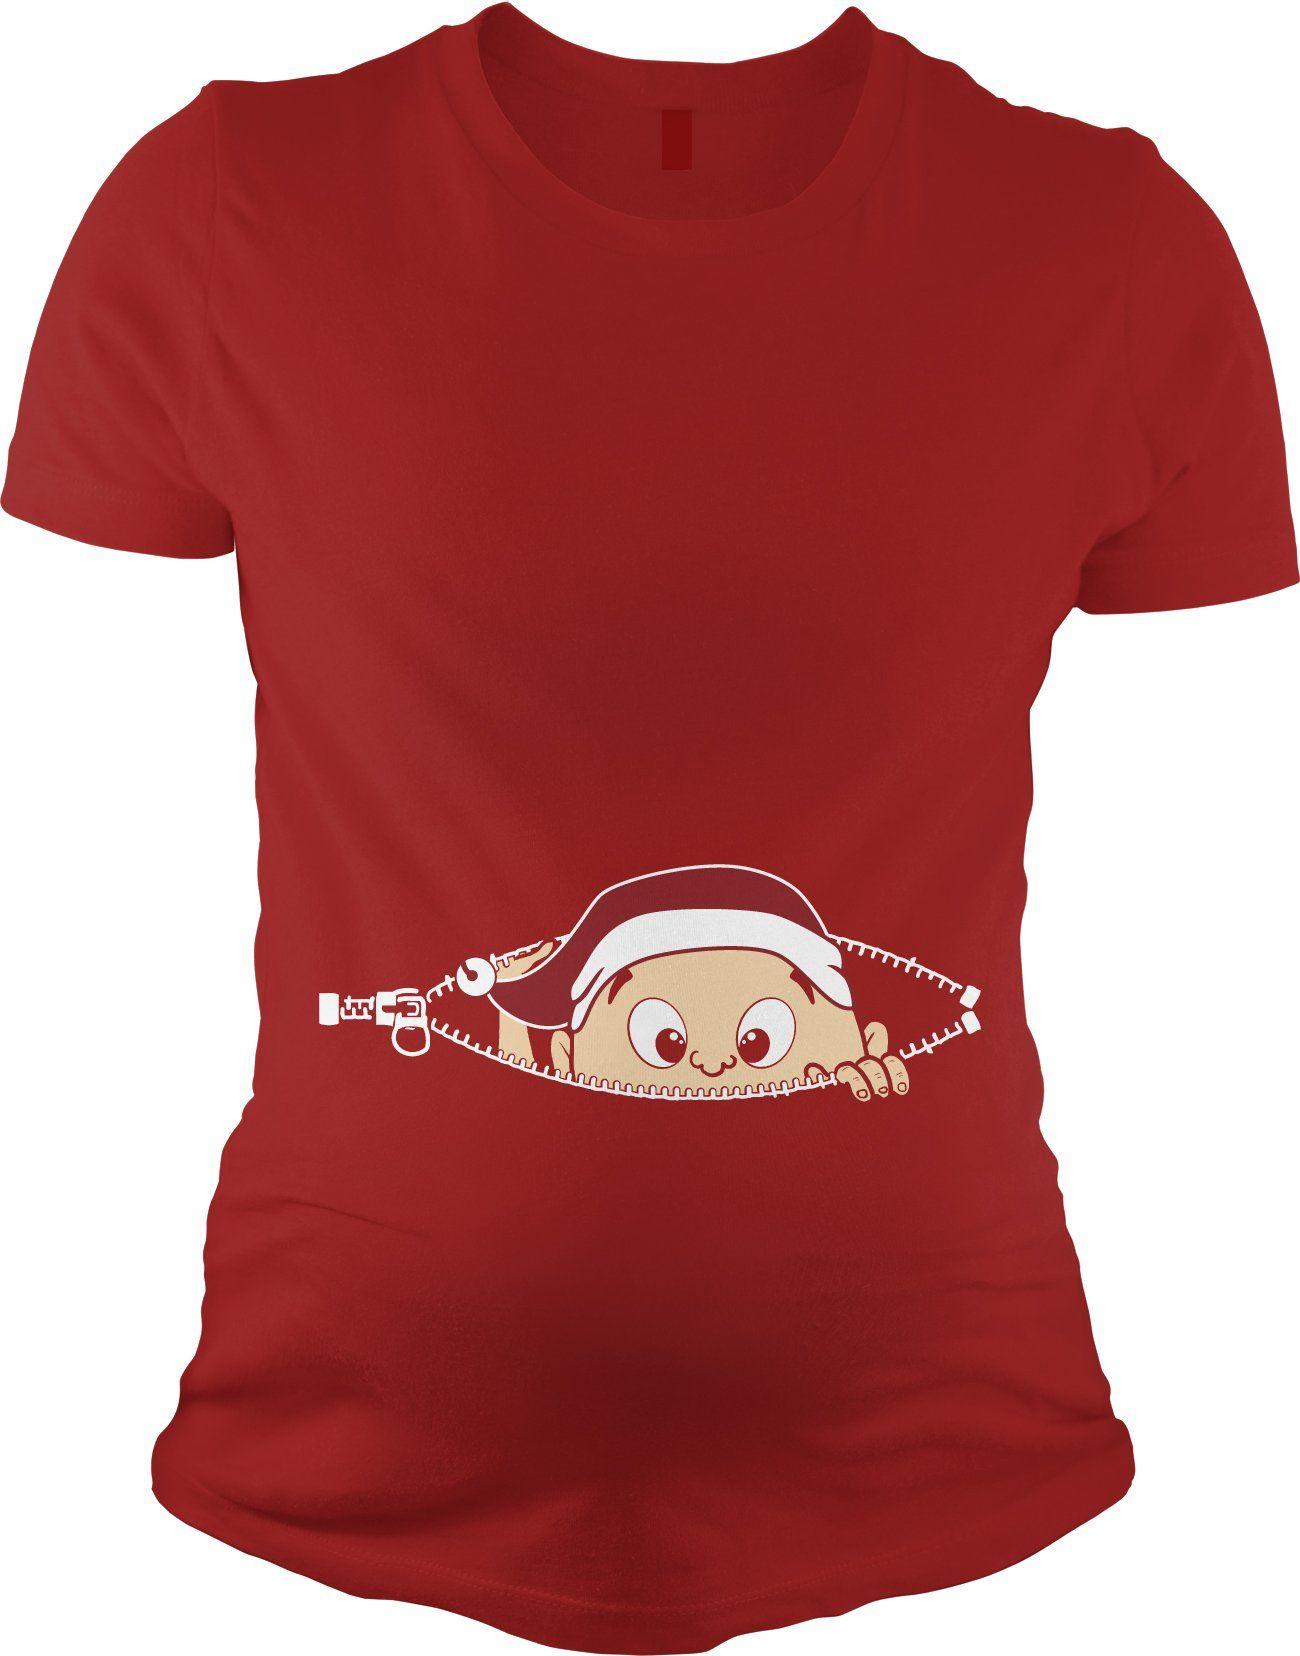 Maternity Christmas Ornament Baby Pregnancy Tshirt Cute Xmas Holiday Tee for Mom to Be